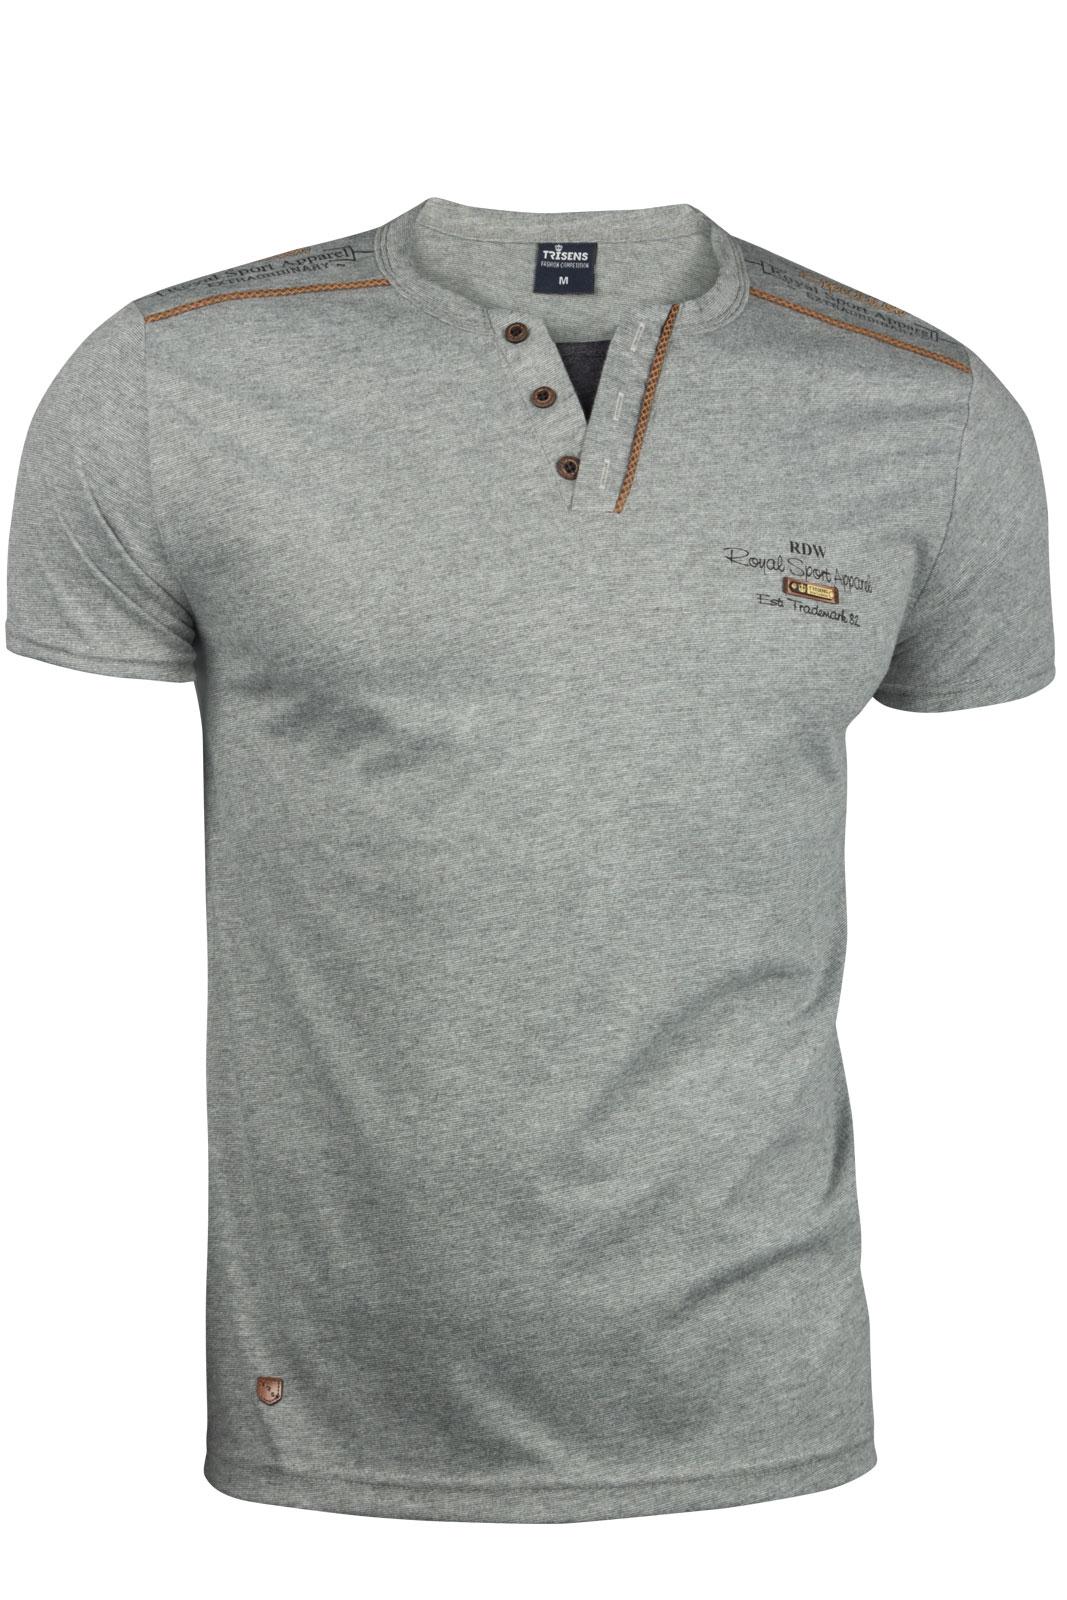 af049f8a28911f Trisens Herren T-Shirt Sommer Polo Cotton Herren Mode T-Shirts